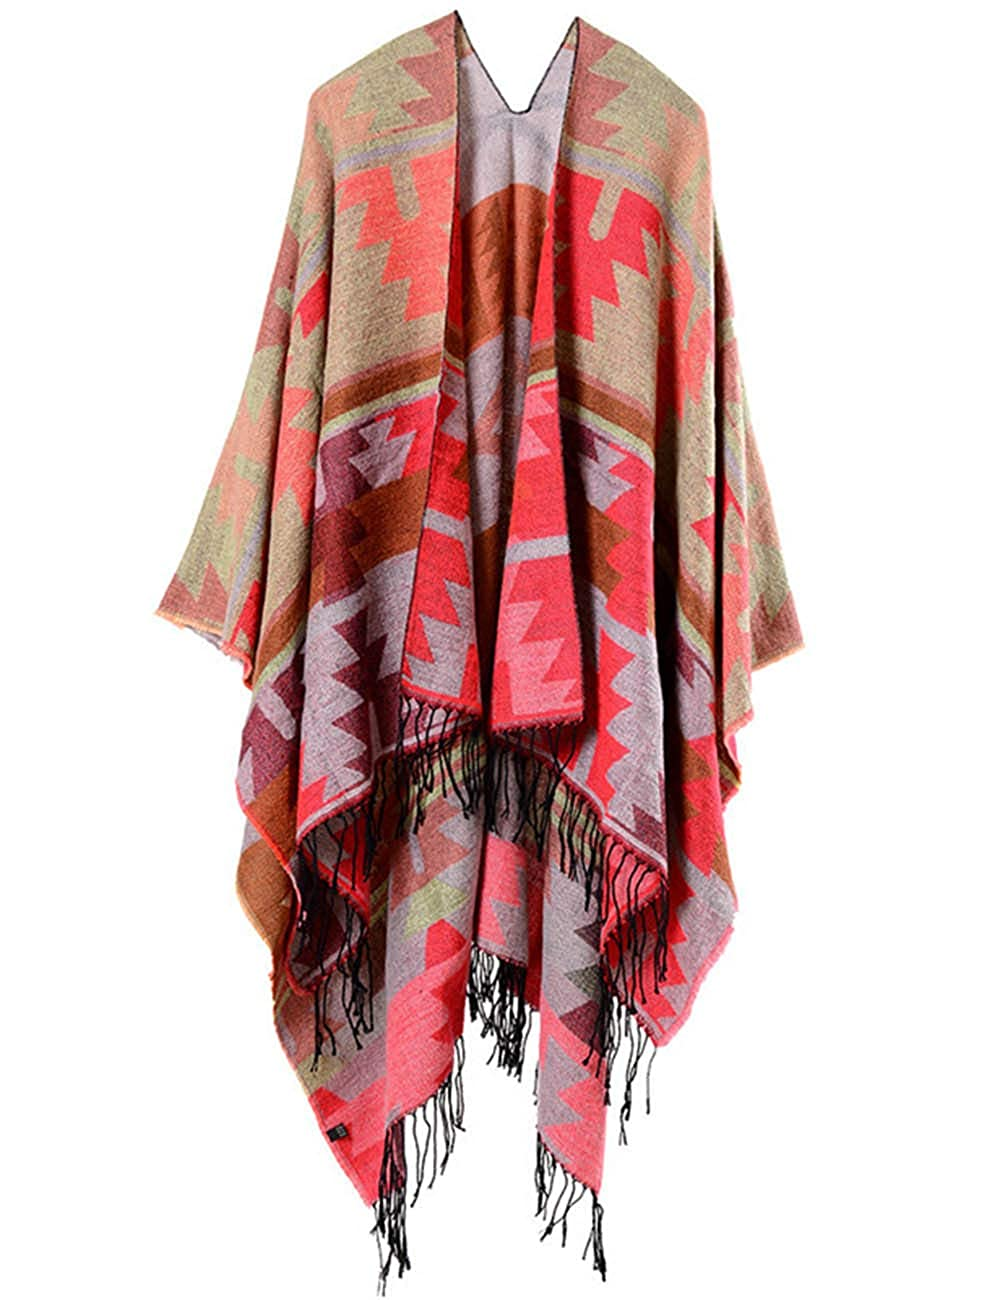 XXXITICAT Women's Plaid Pattern Wrap Shawl Cardigan Poncho Cape